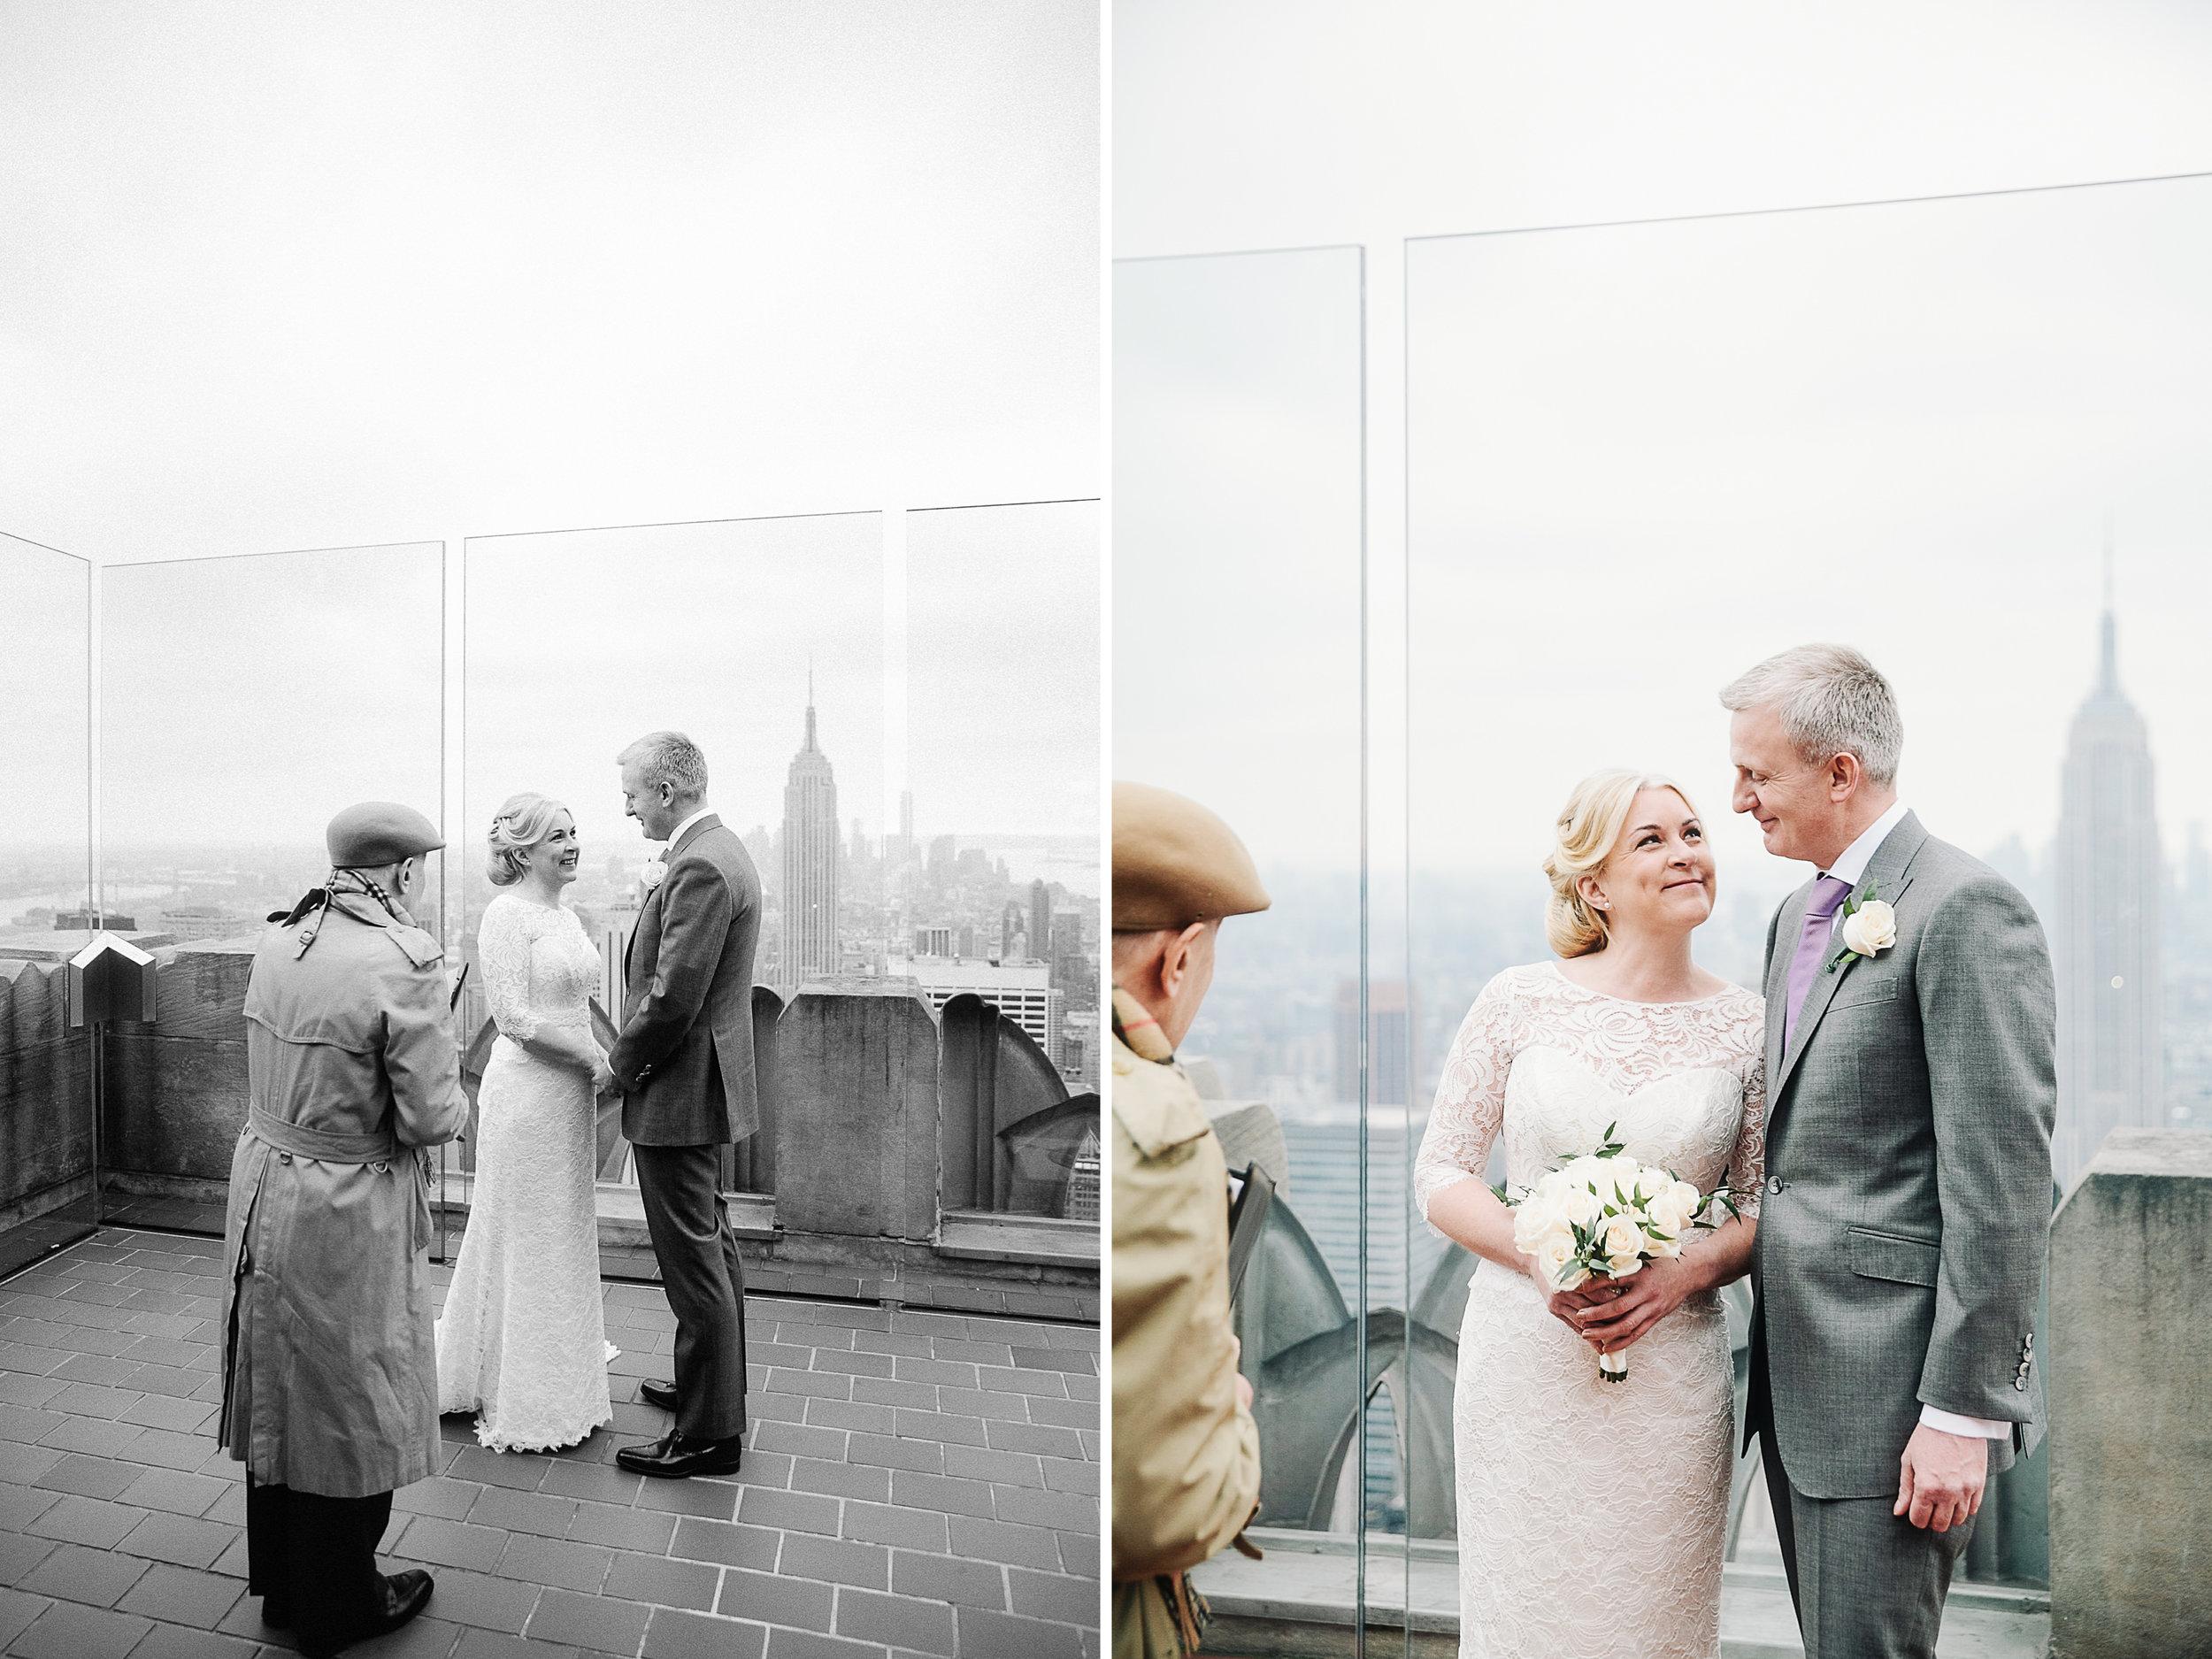 S&B_fourseasons_hotel_nyc_elopement_12.jpg